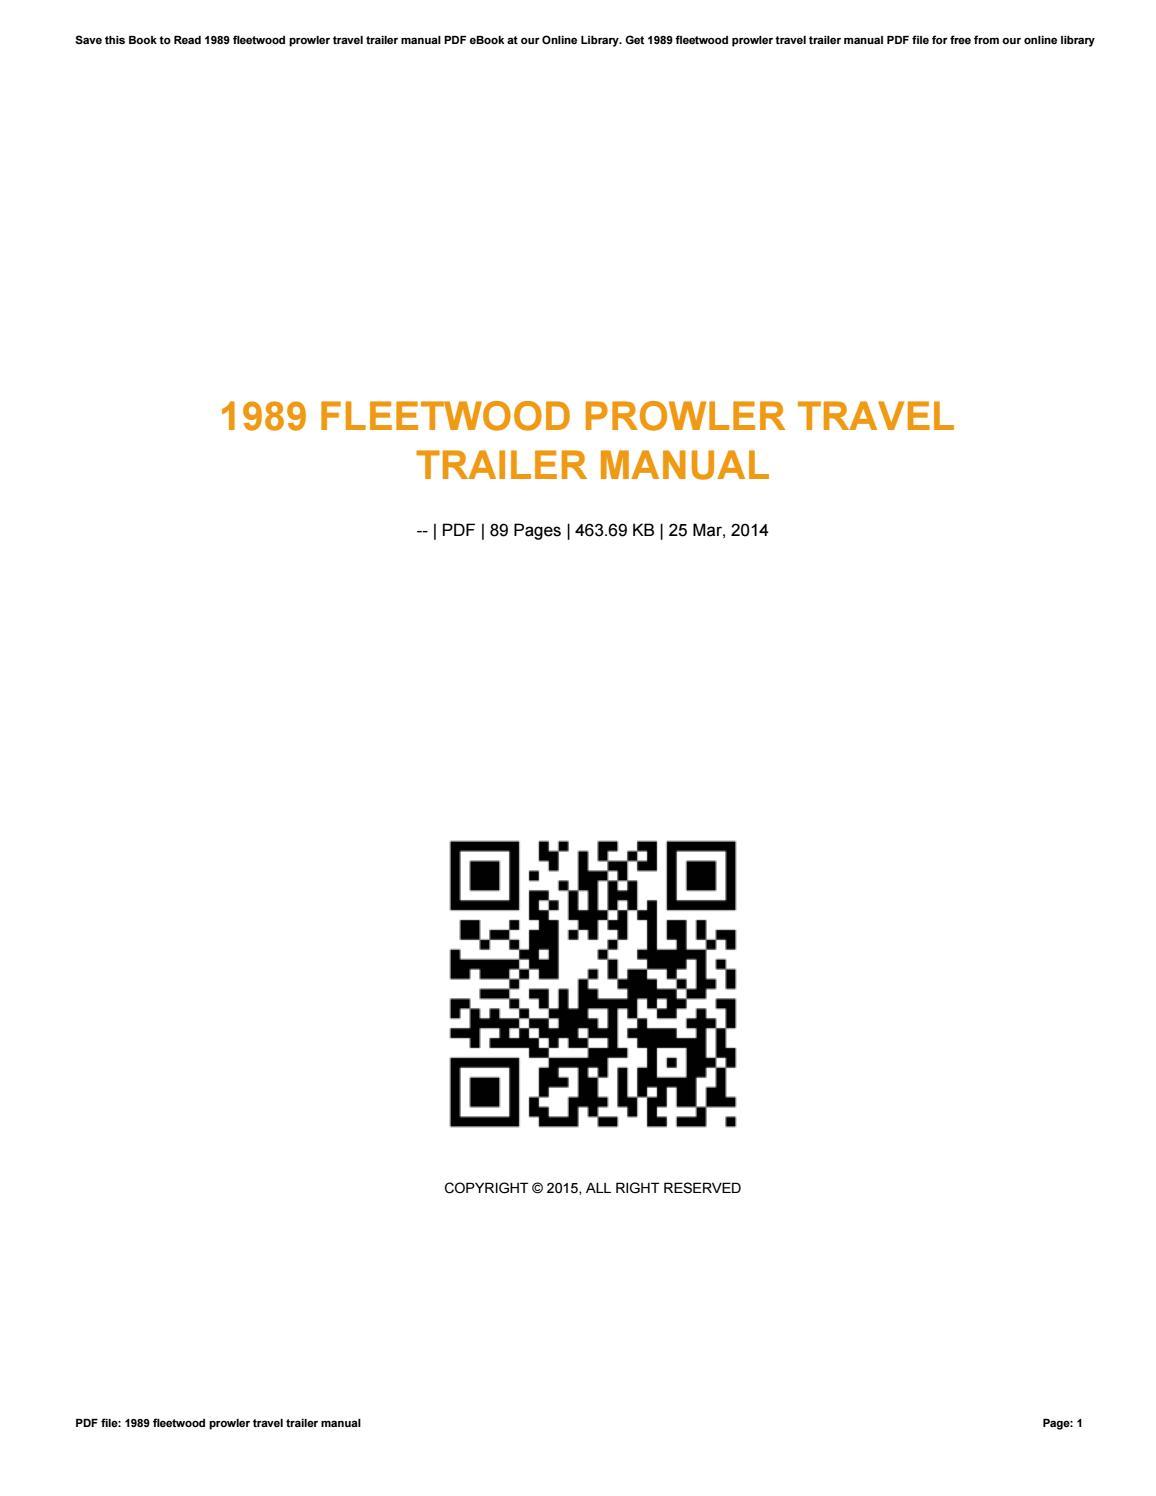 [PDF-5531] 1989 Fleetwood Prowler Travel Trailer Manual